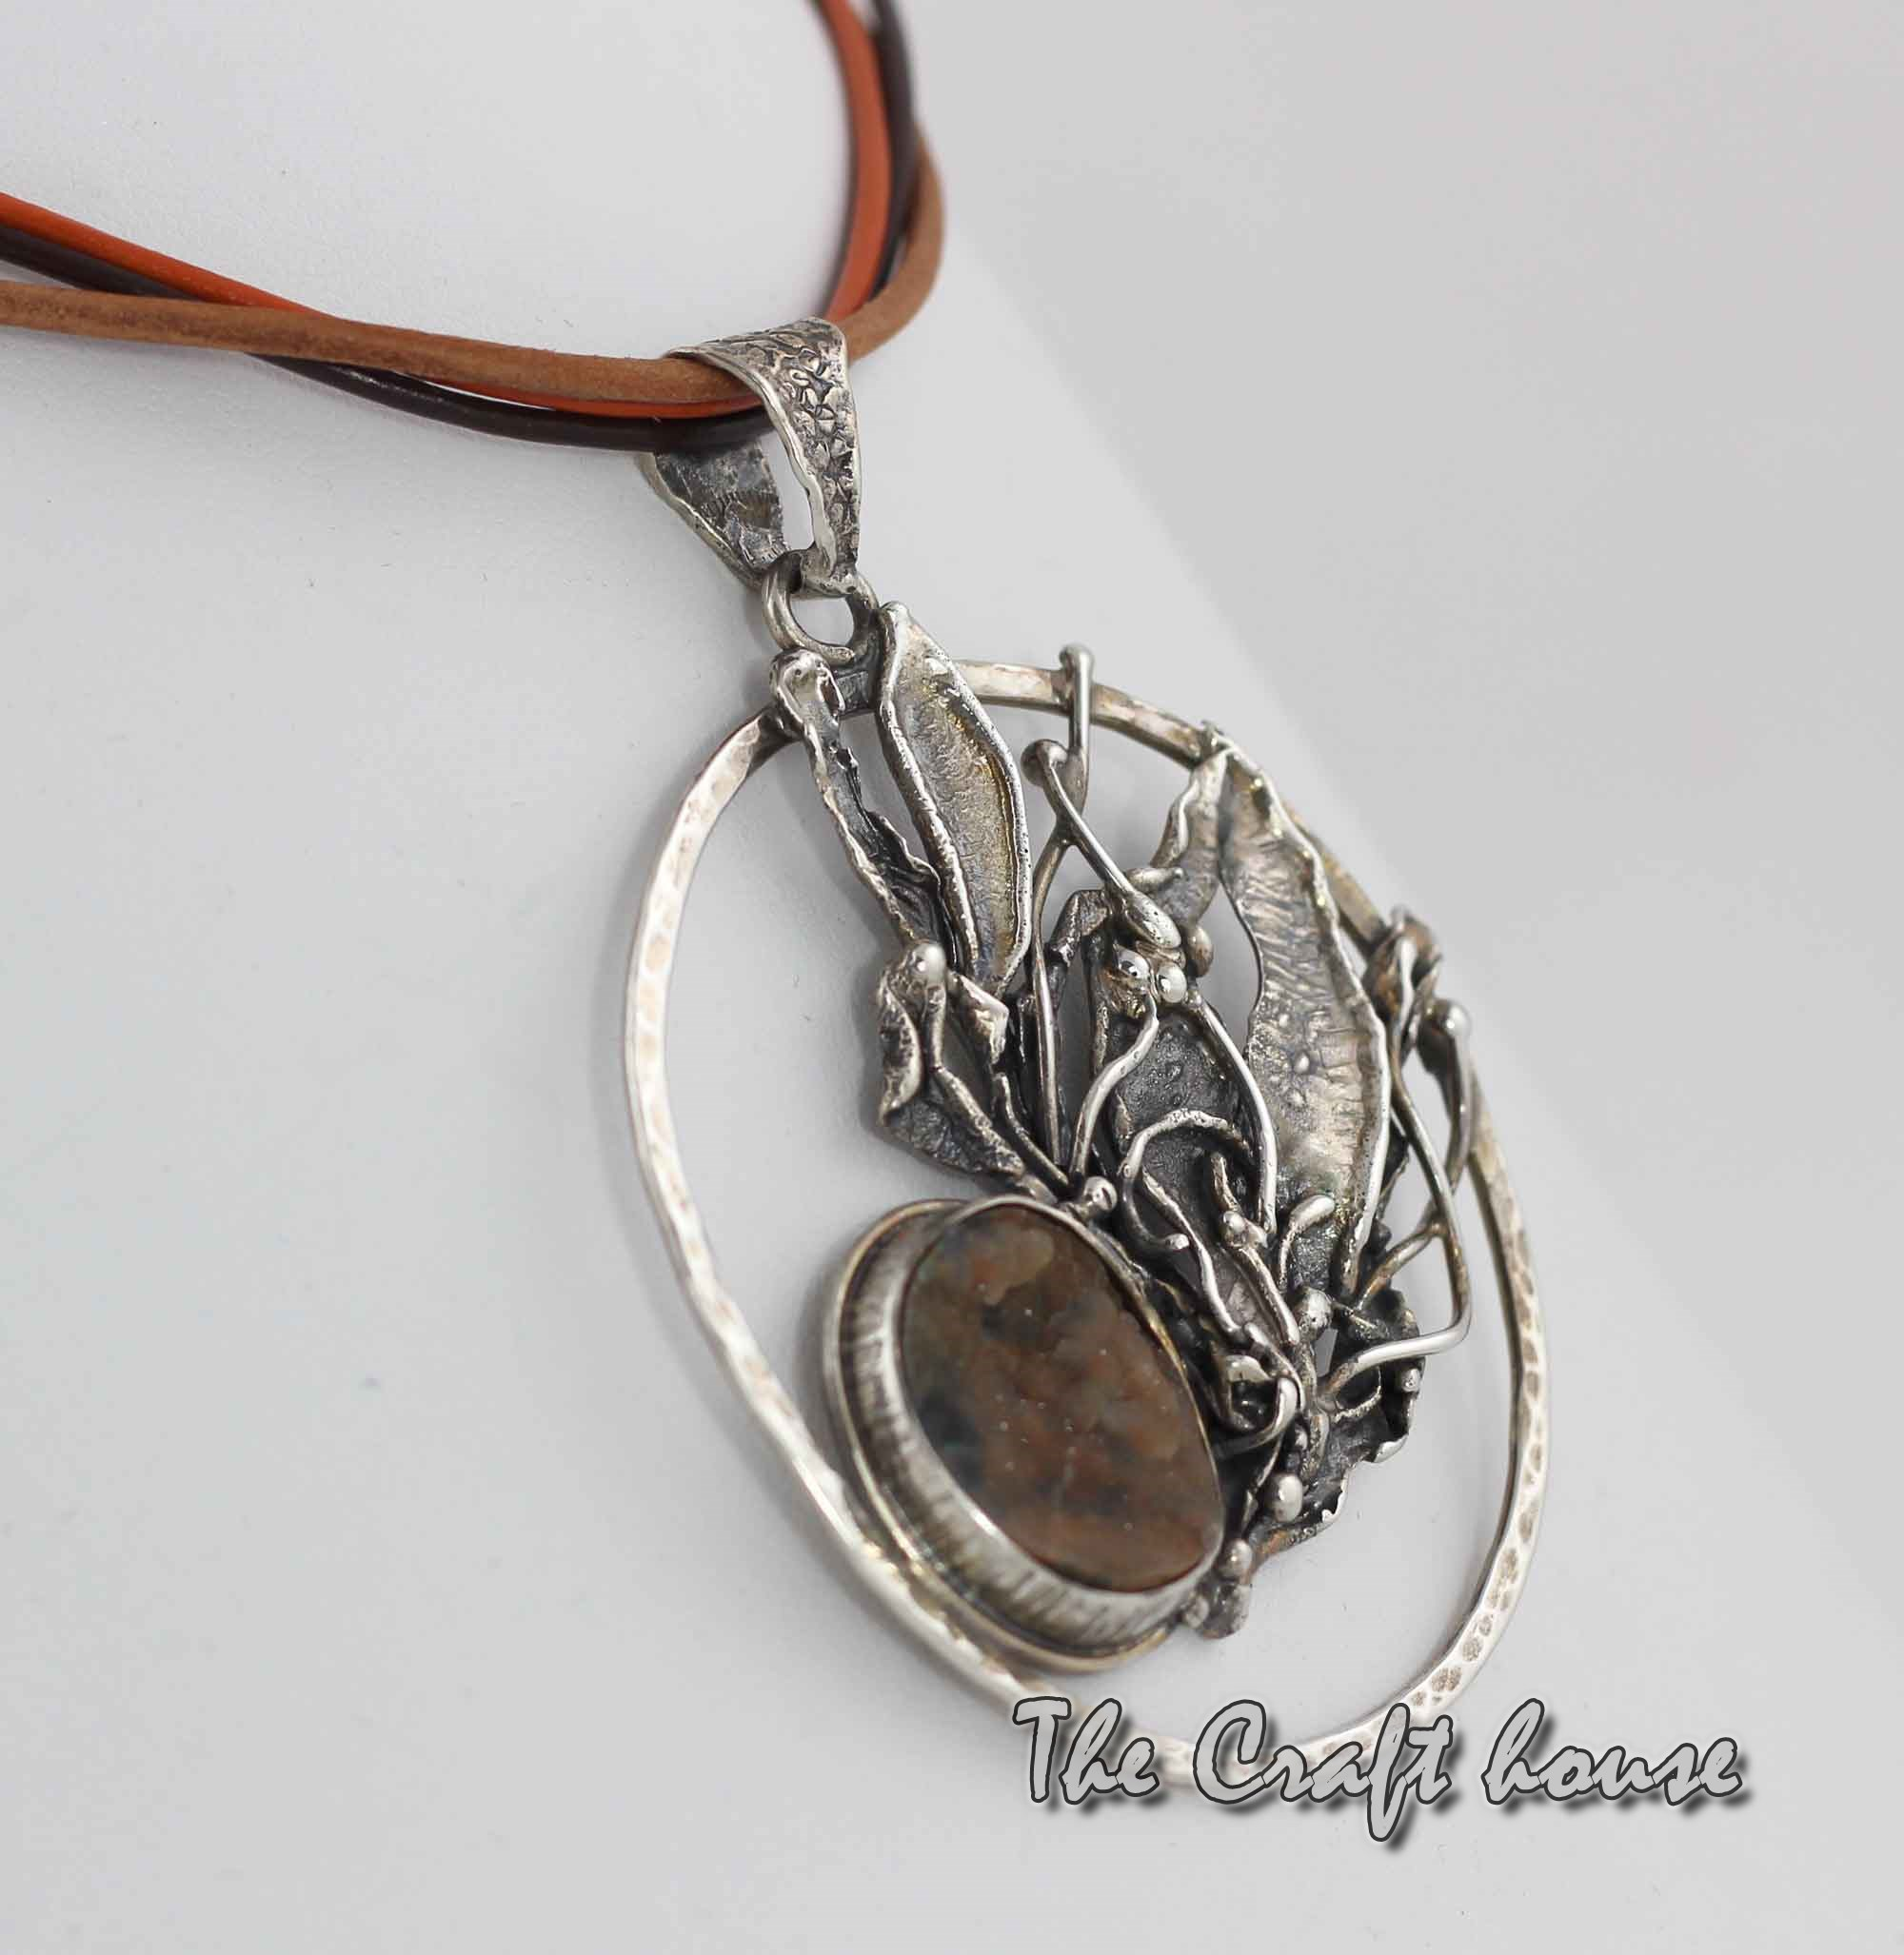 Silver pendant with Chrysoprase